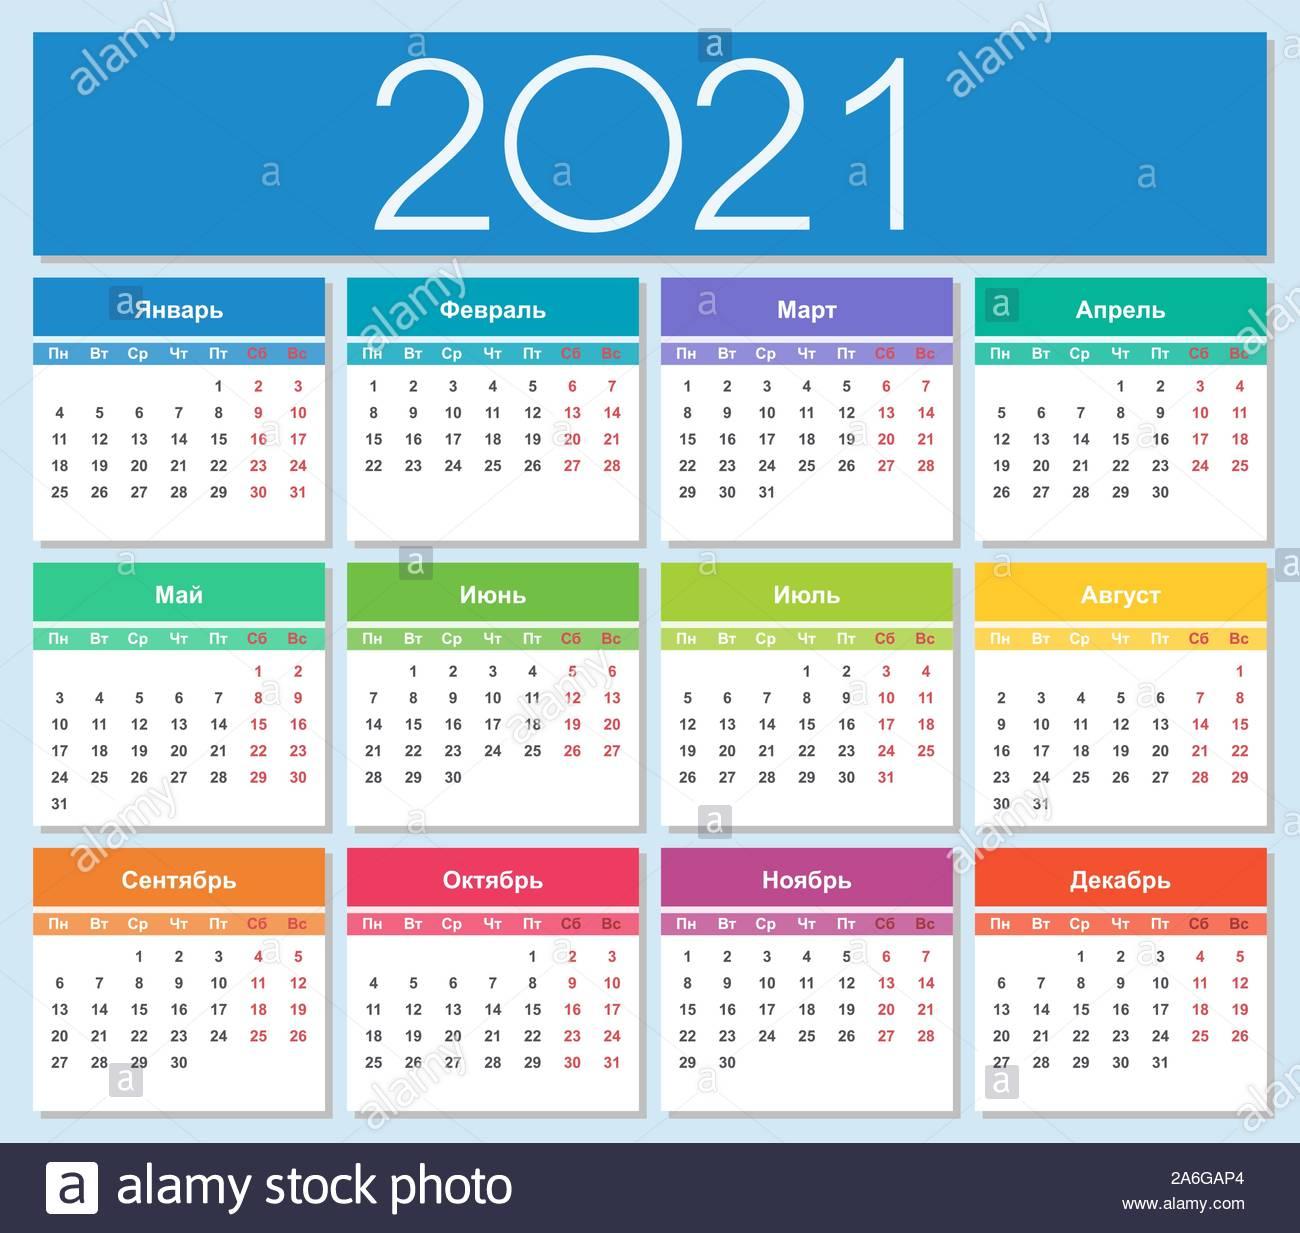 Calendar 2021 Stock Photos Calendar 2021 Stock Images